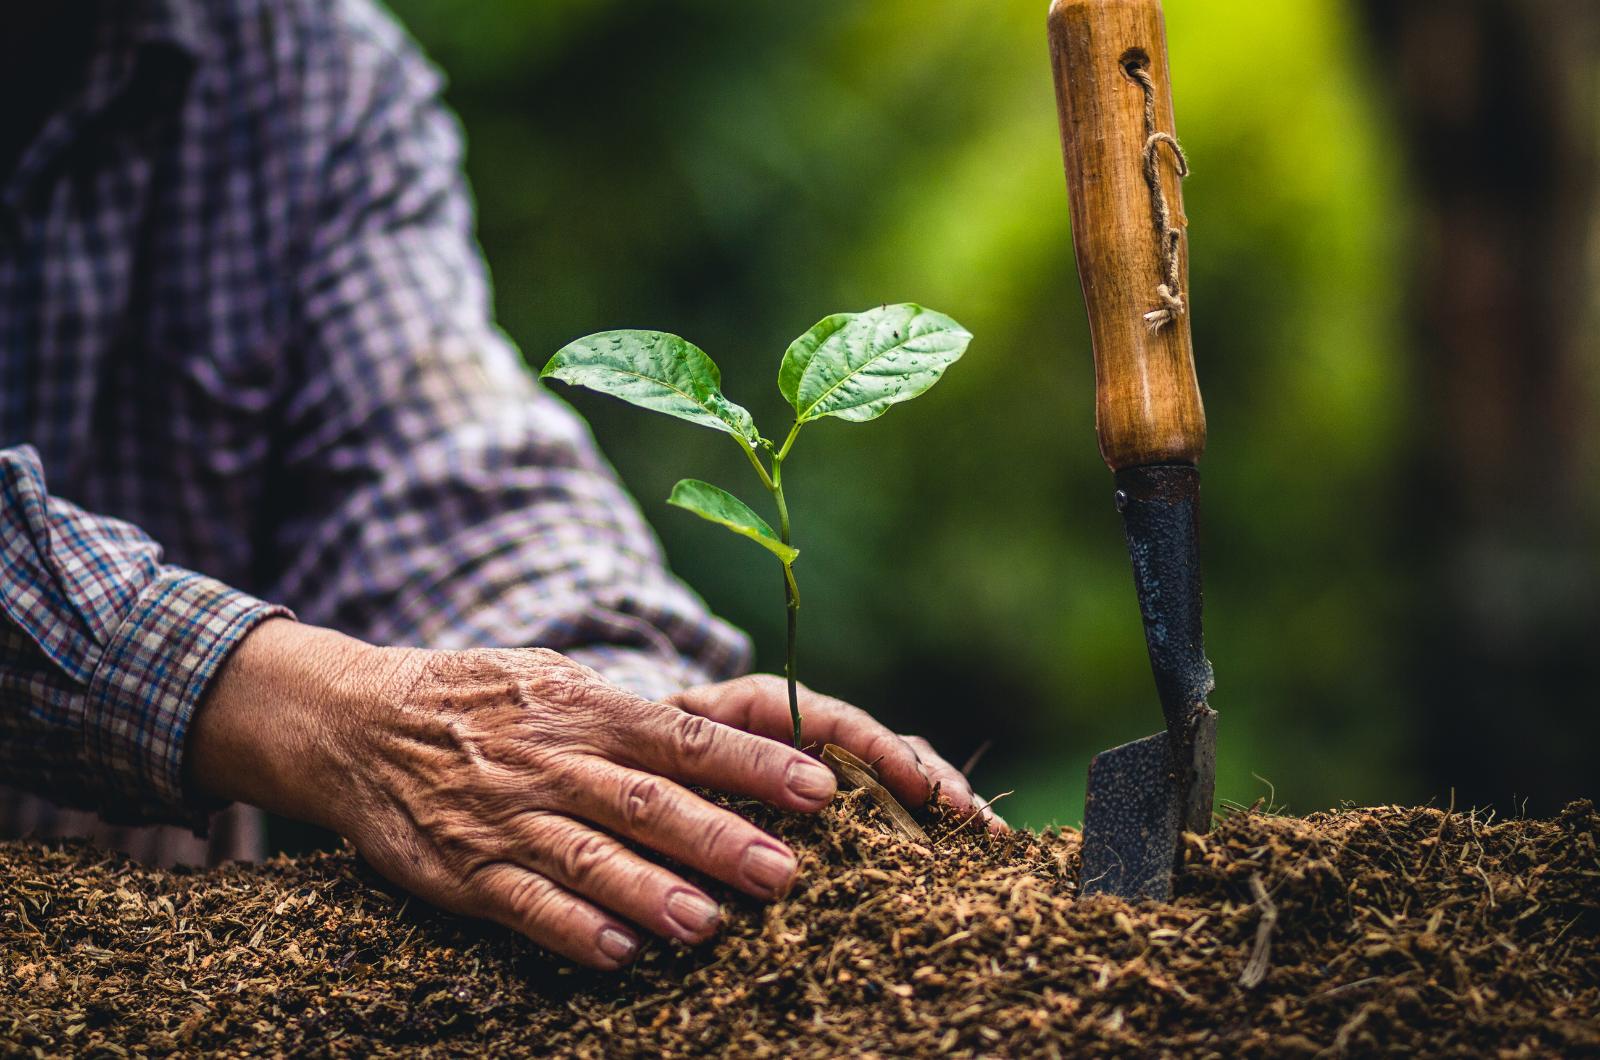 Ontario Contributes 880,000 trees to Living Tribute